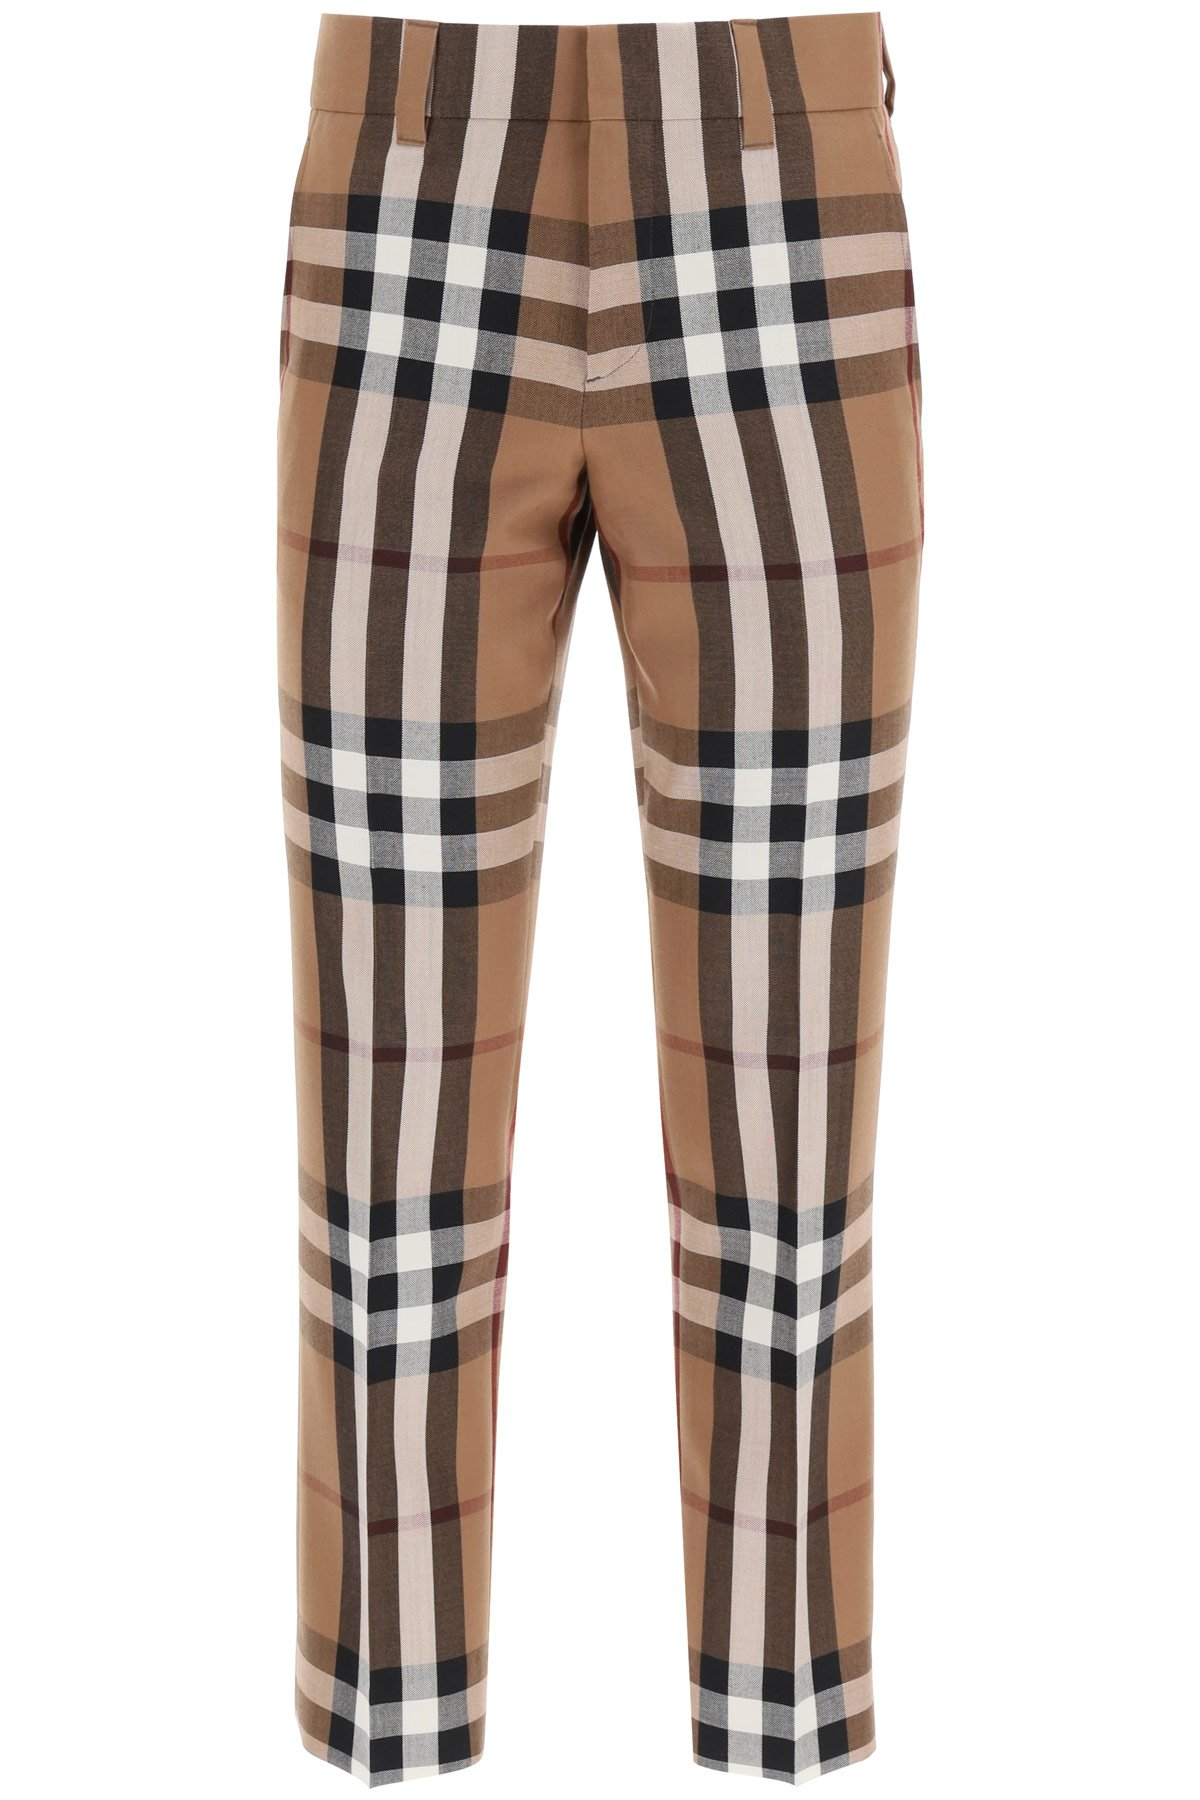 Burberry pantaloni in lana house check